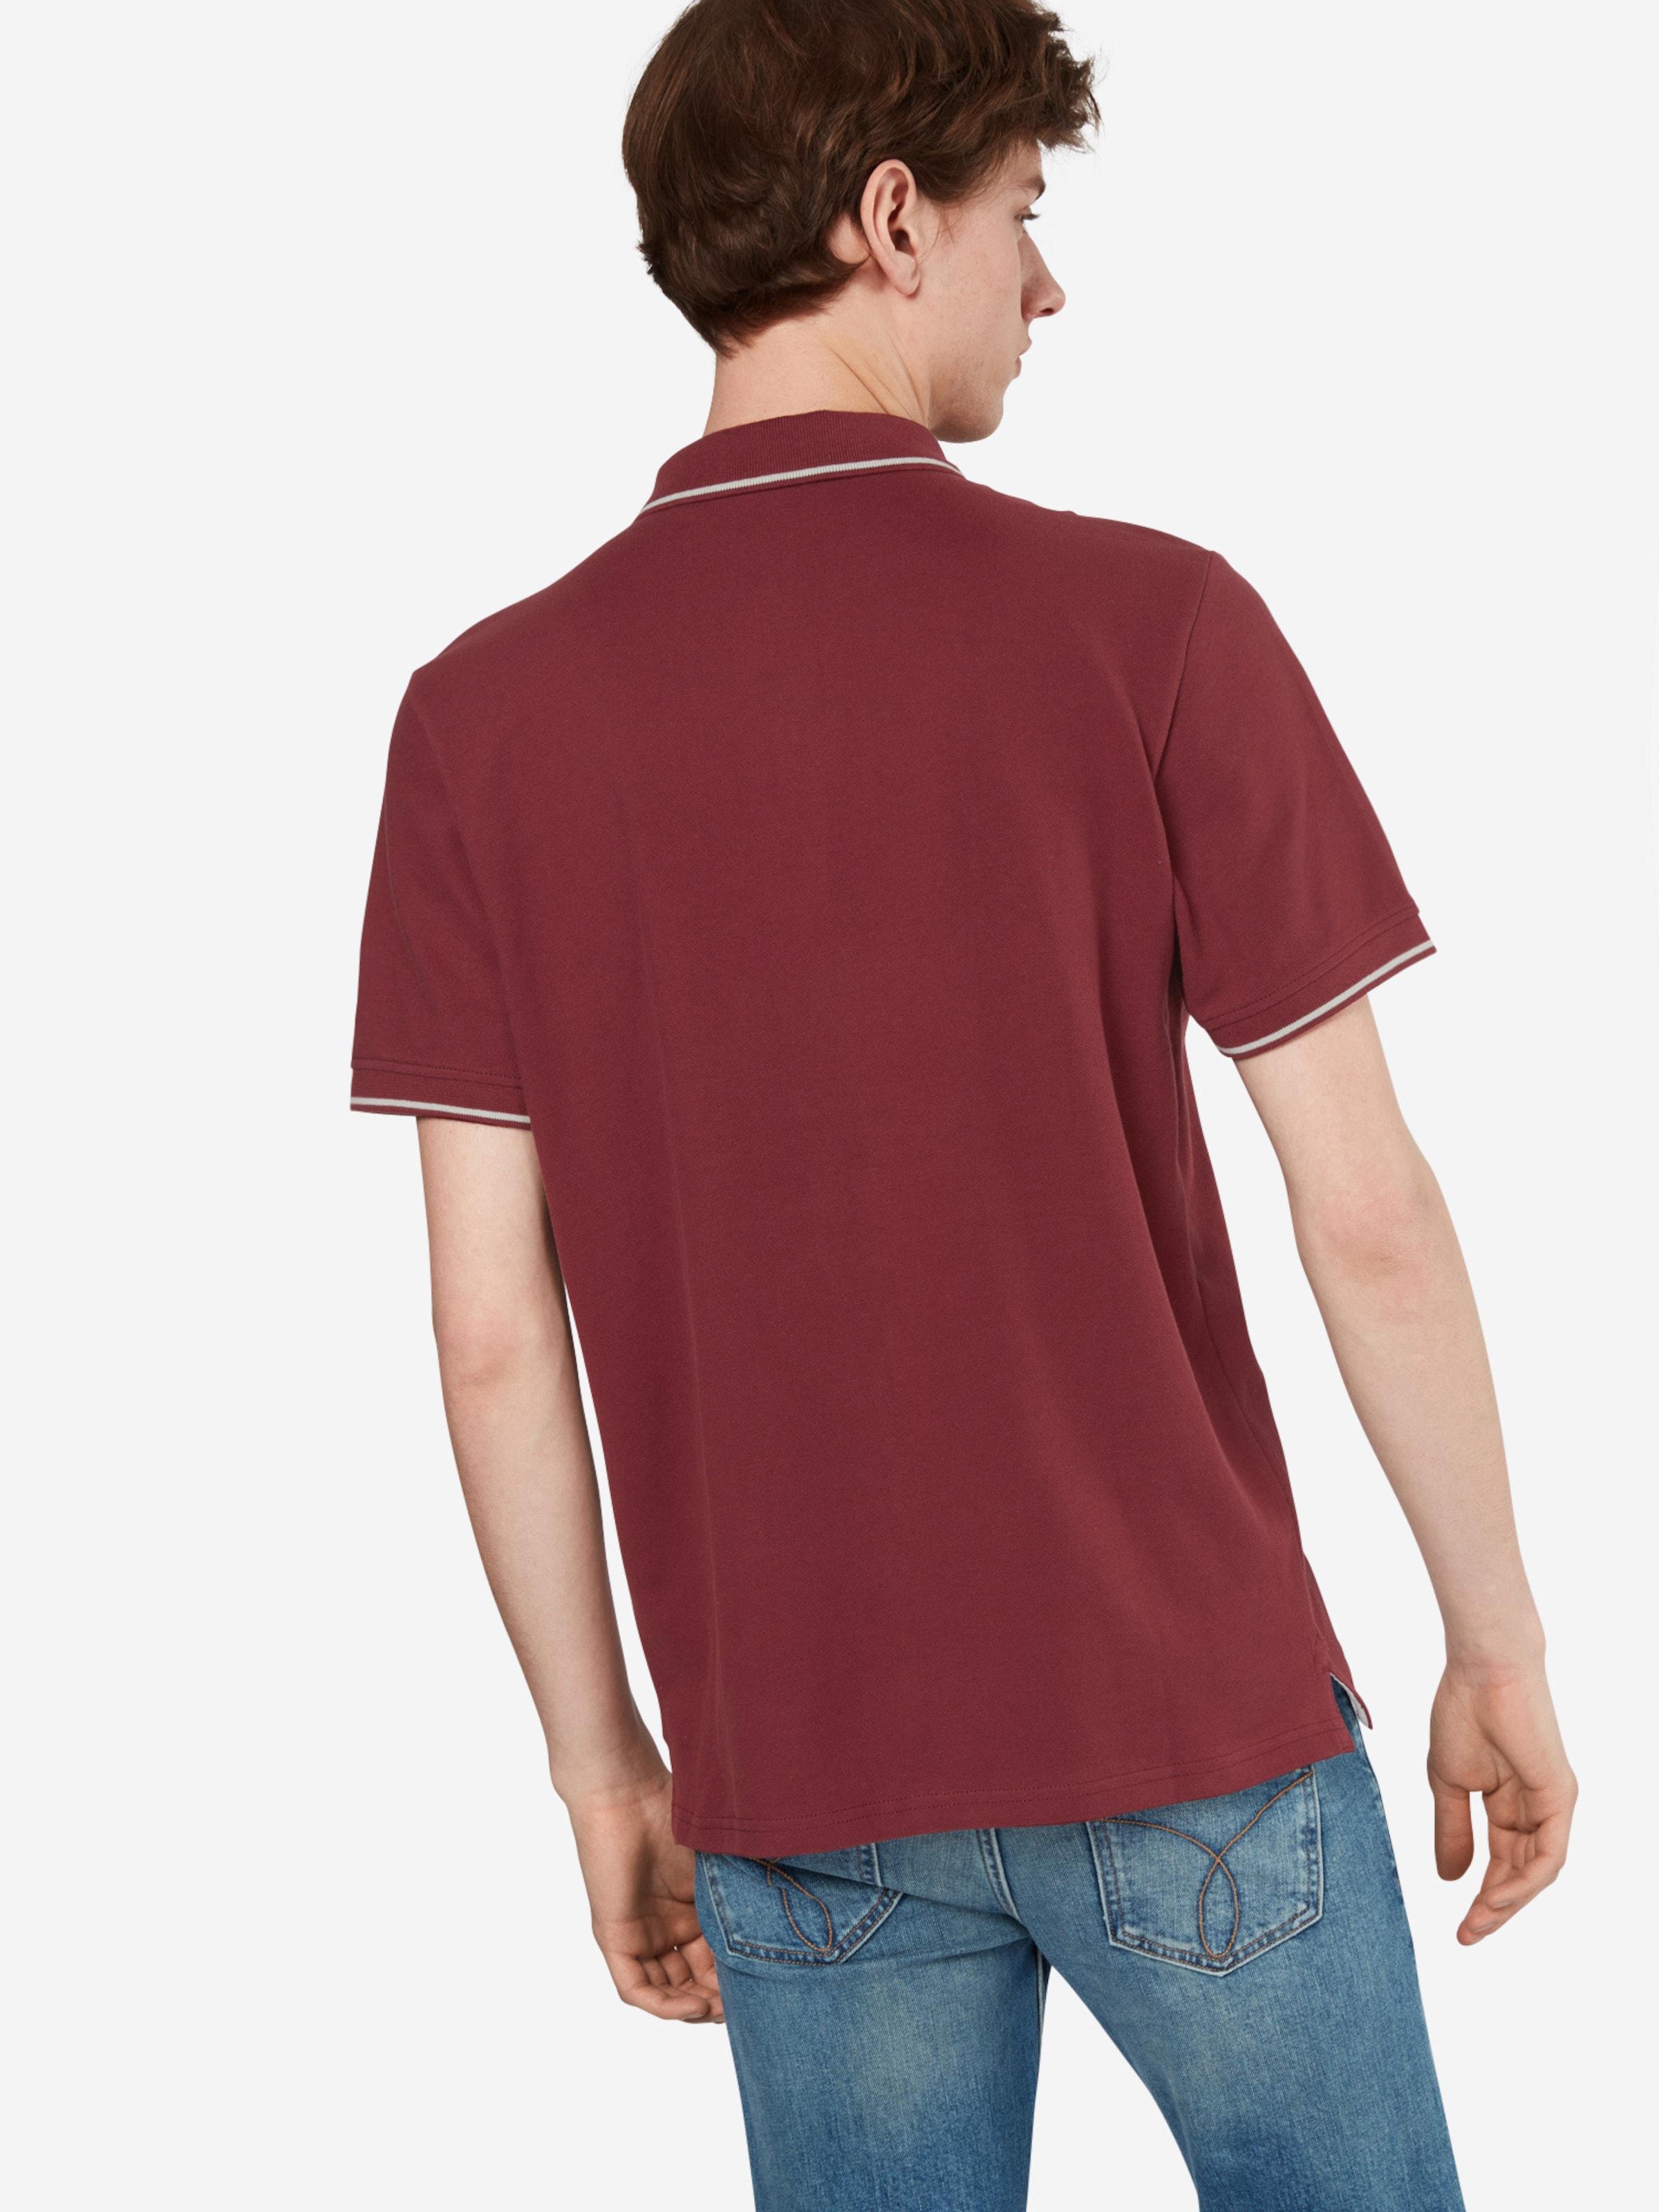 TOM TAILOR Poloshirt Outlet Angebote oz6C4fN